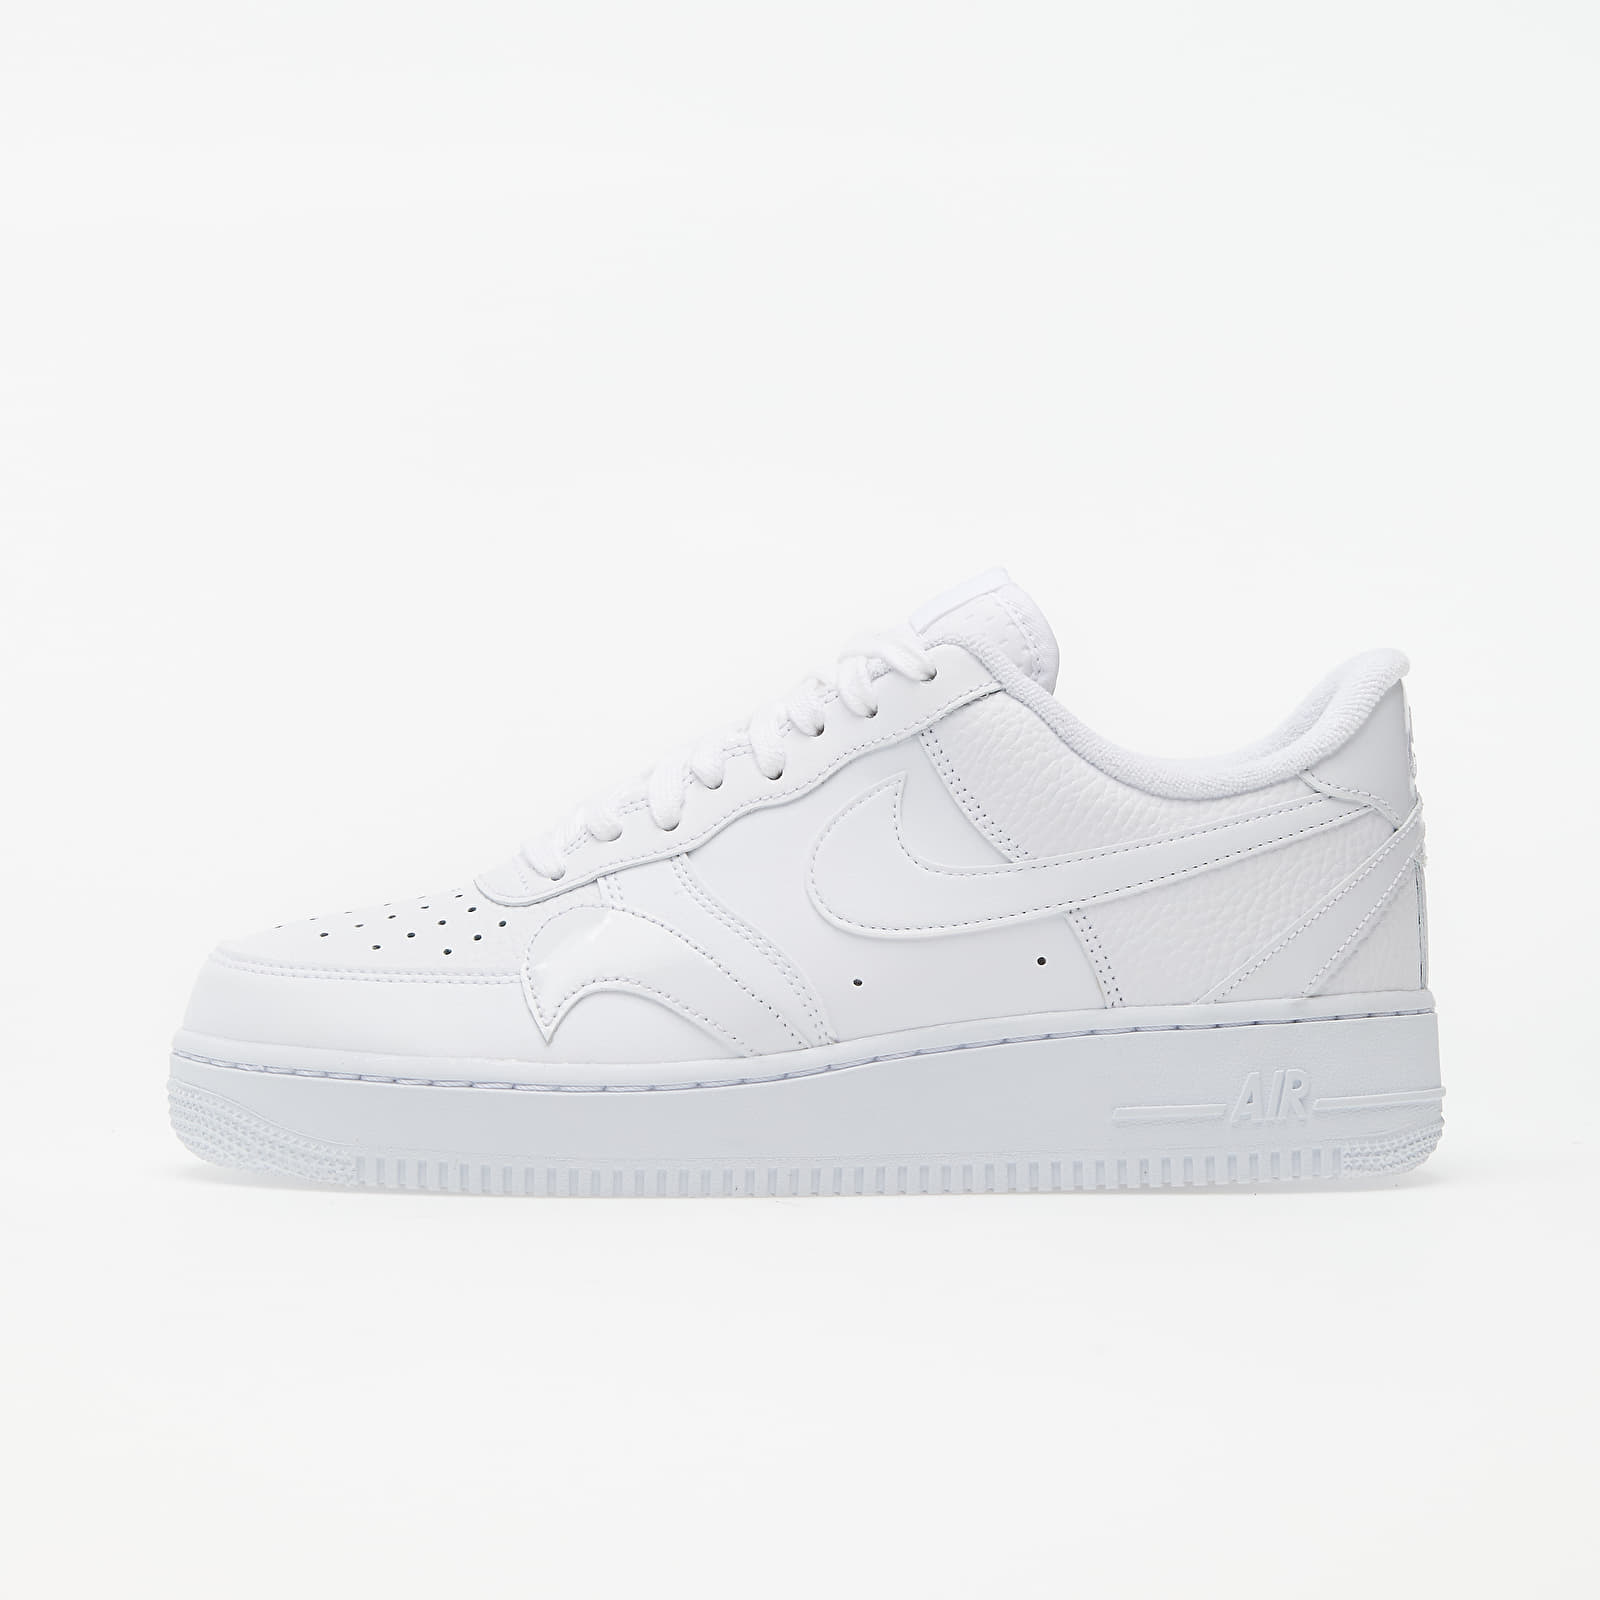 Nike Air Force 1 '07 LV8 White/ White-White EUR 46